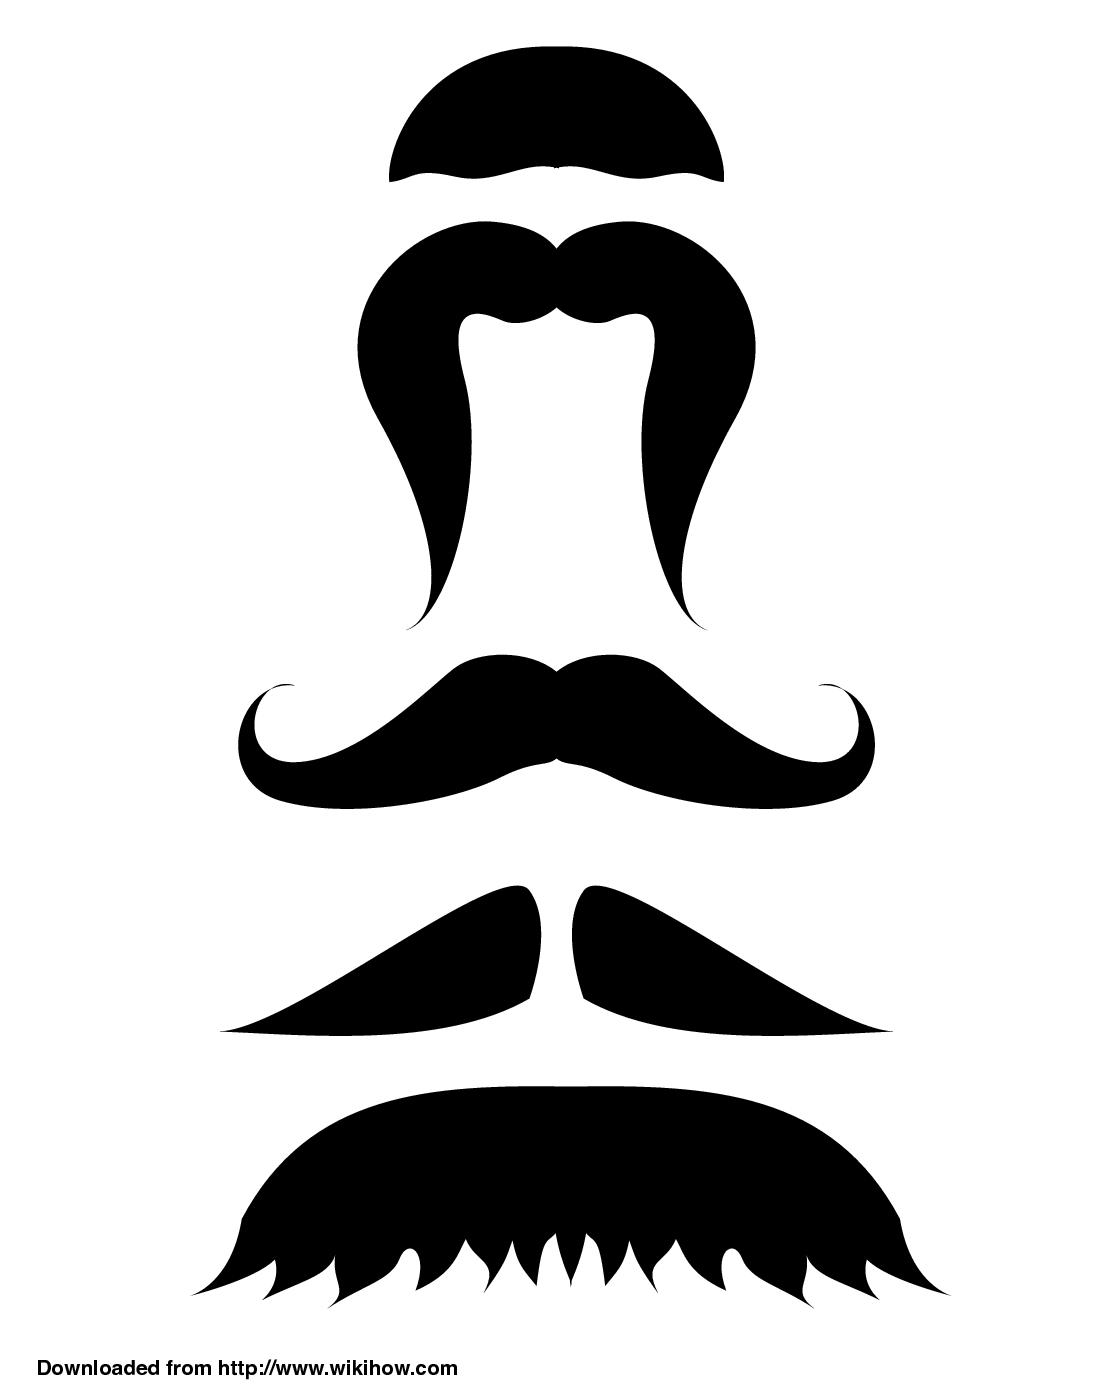 Fake mustache clipart transparent Fake Mustache Cliparts - Cliparts Zone transparent